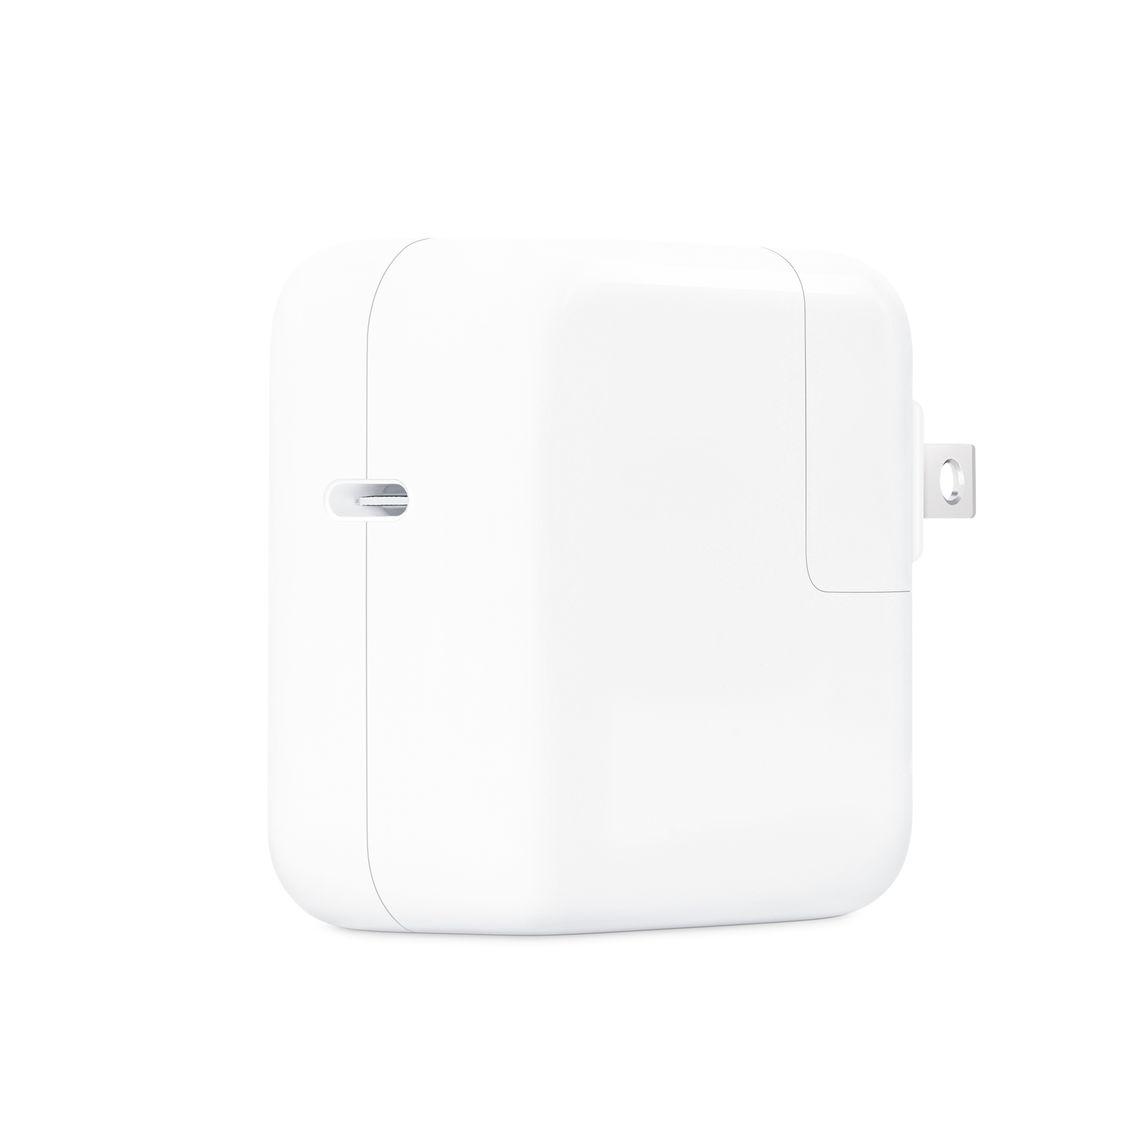 30W USB‑C Power Adapter - Apple